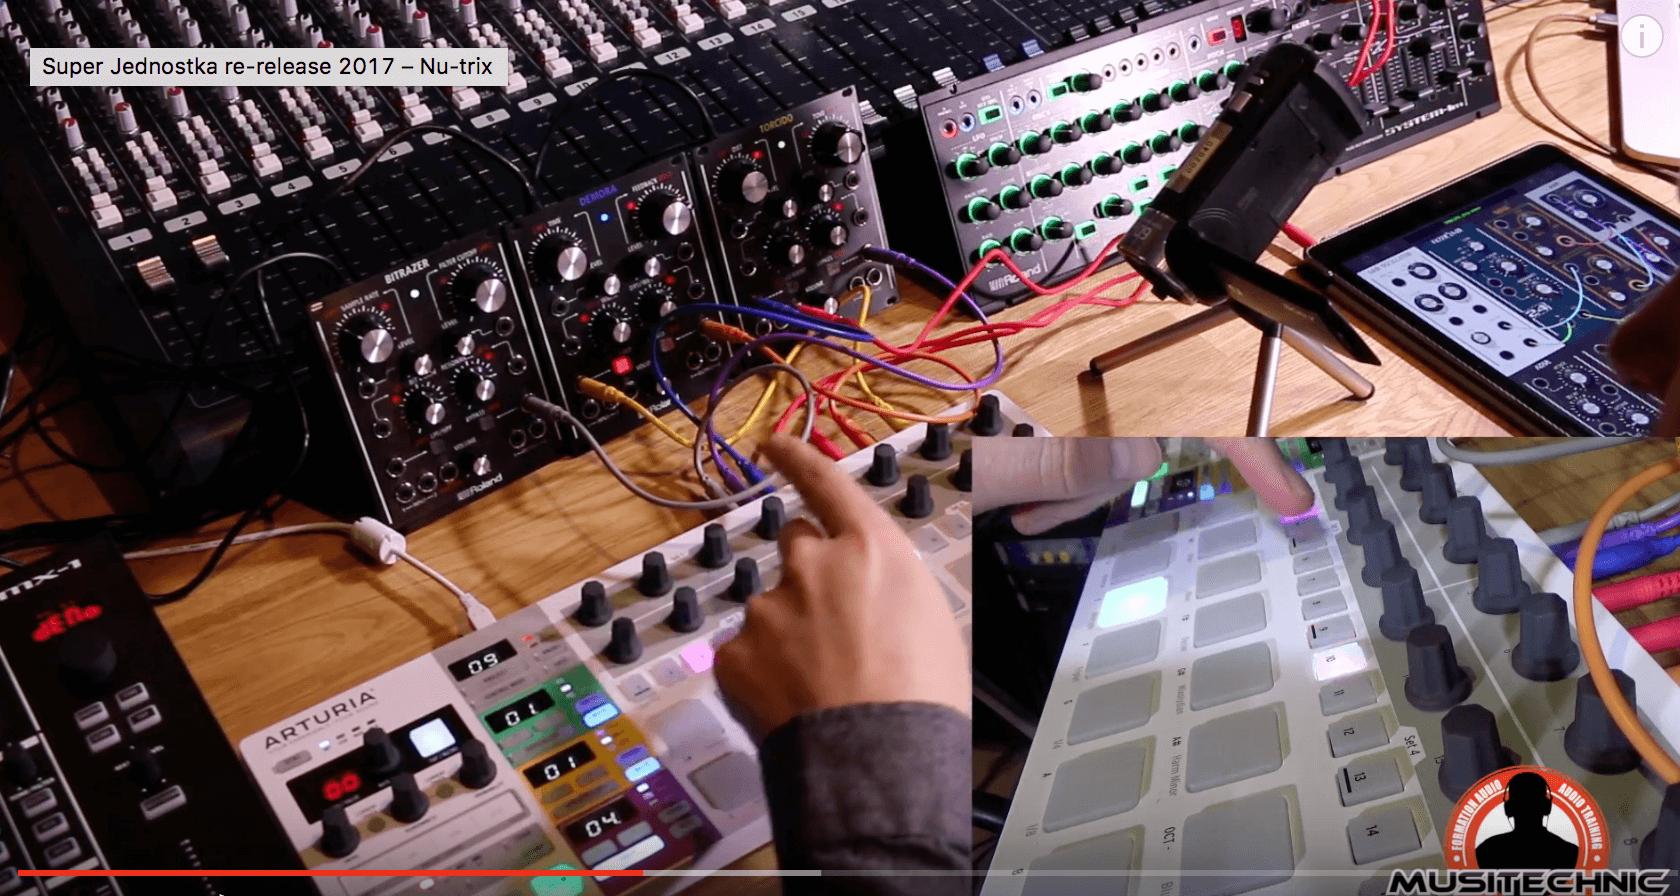 Modular synth – Roland effectors – Arturia BeatStep Pro